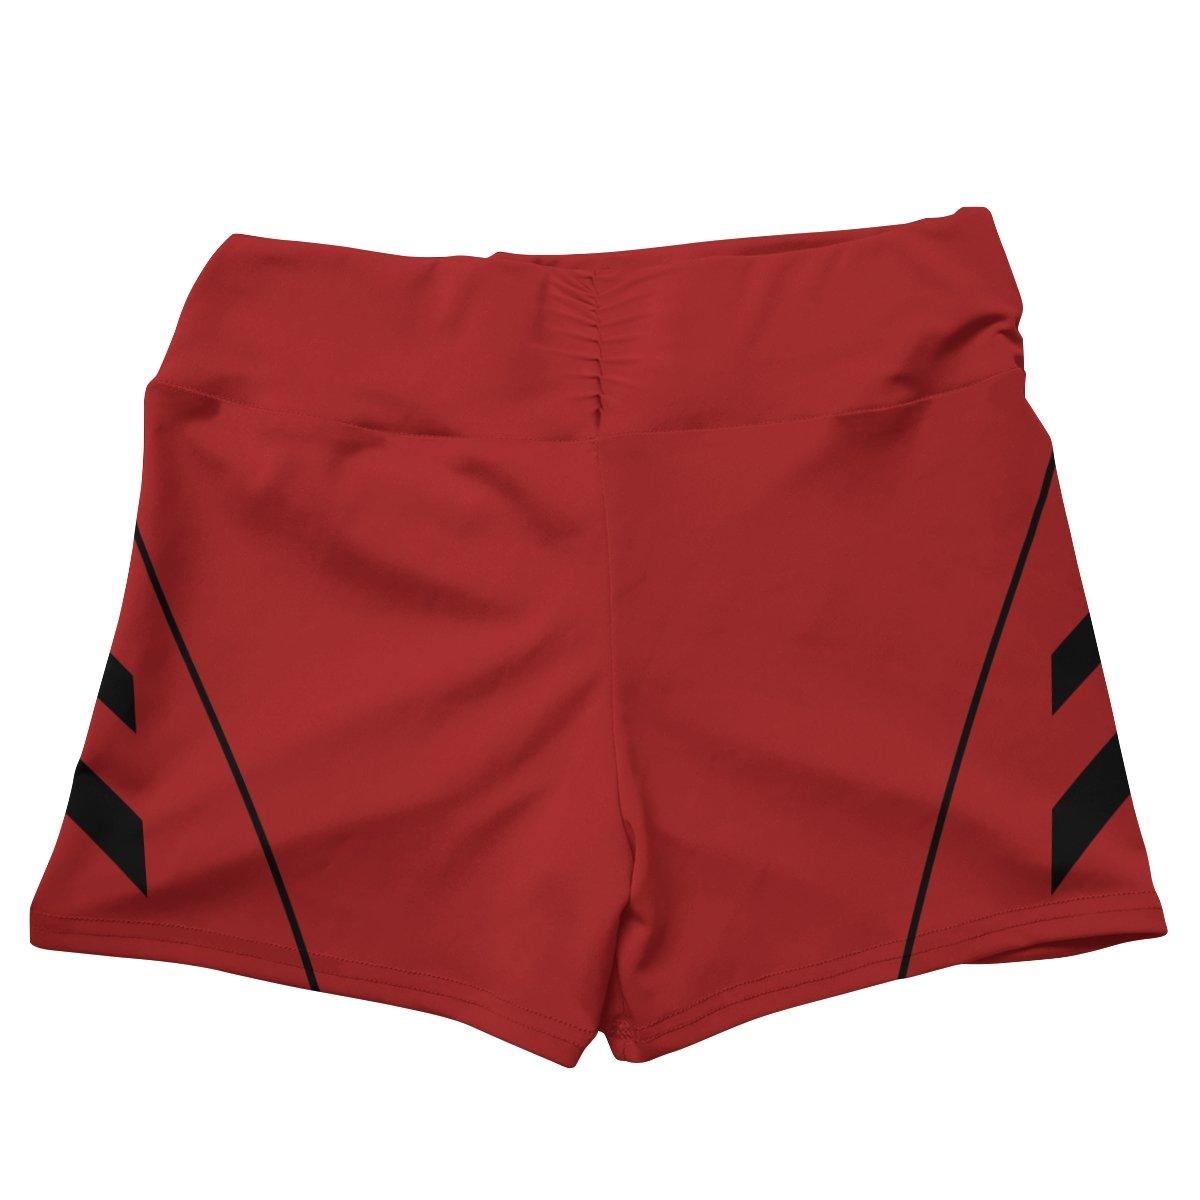 neon genesis asuka active wear set 958422 - Anime Swimsuits